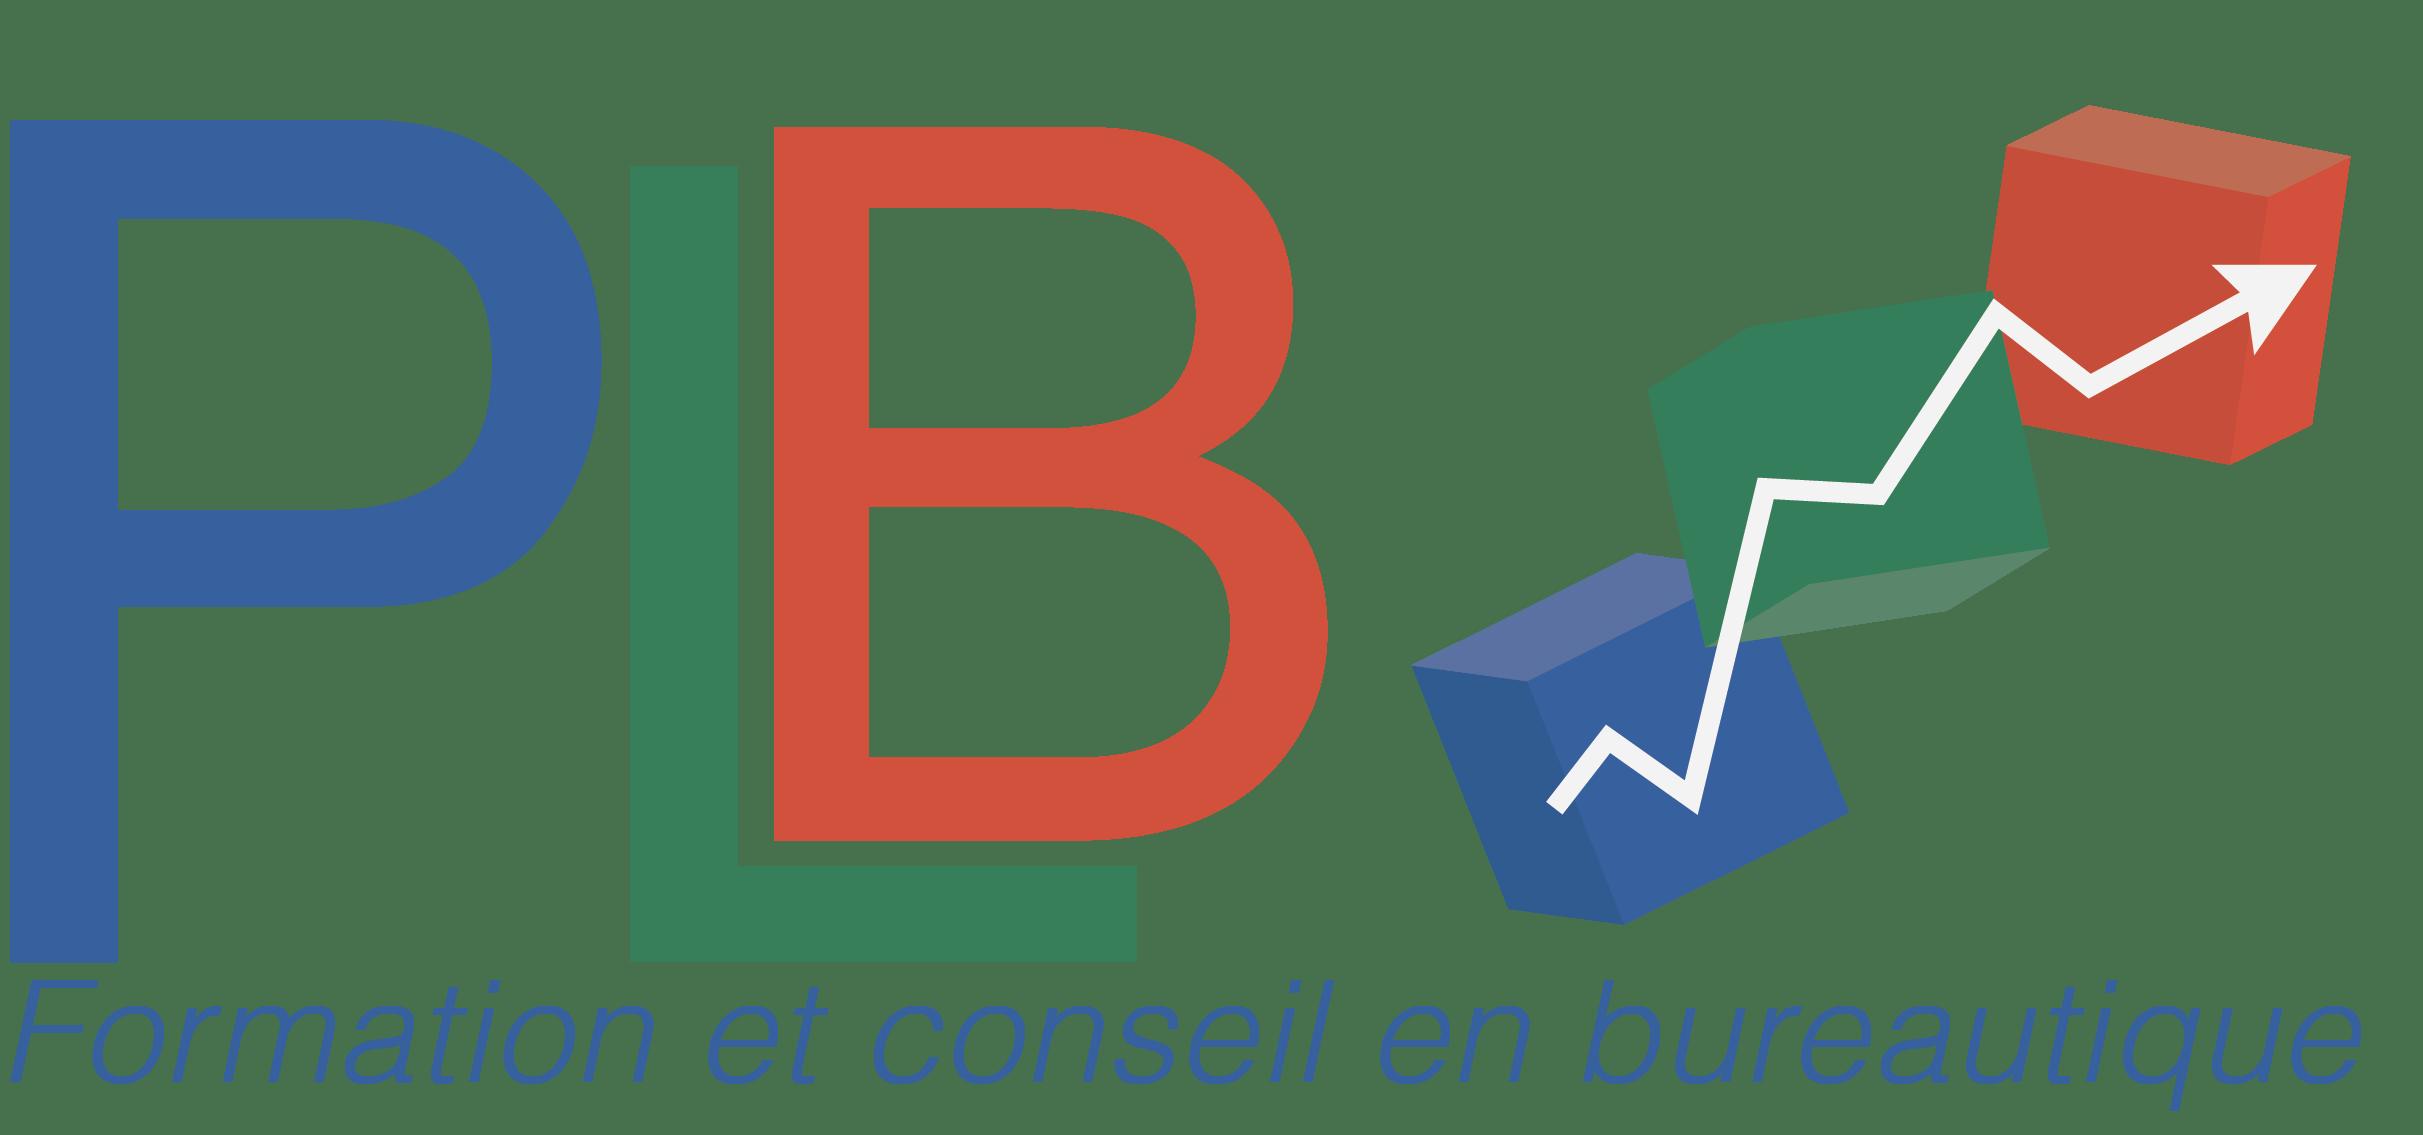 PLB_2_2 – Pierrick LE BALC'H